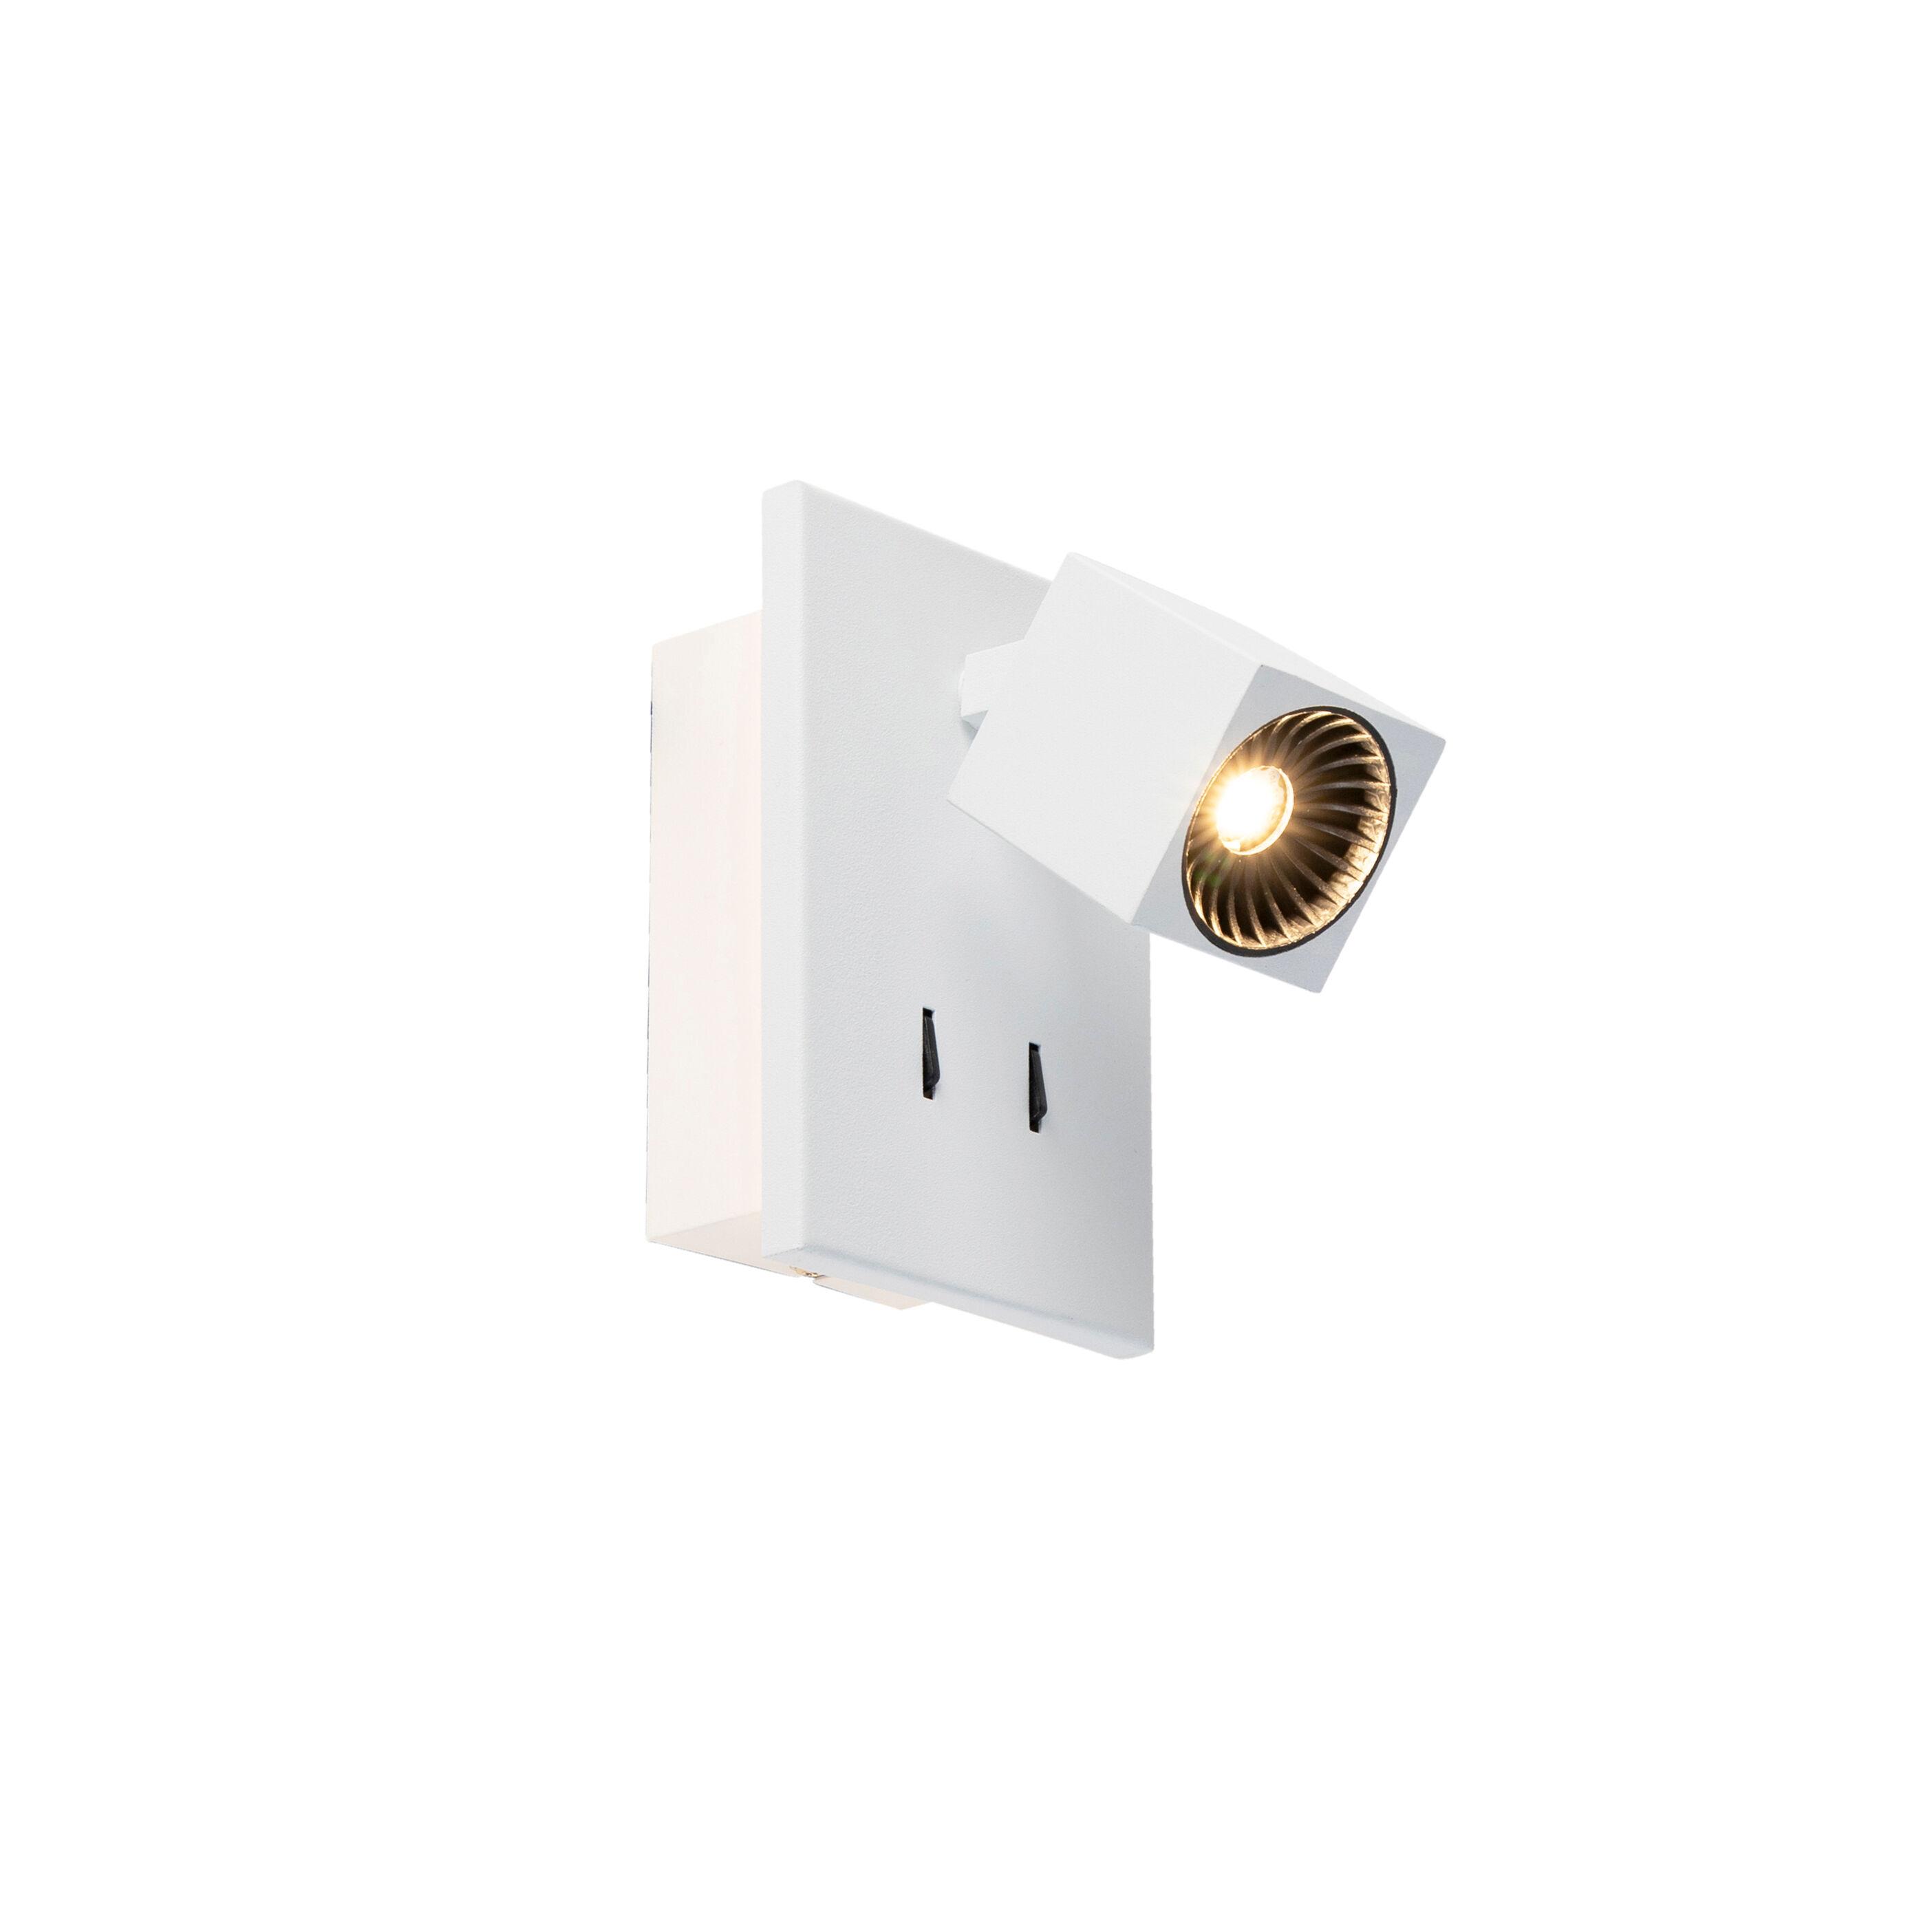 Trio Leuchten Applique moderne blanc avec LED - Cupra